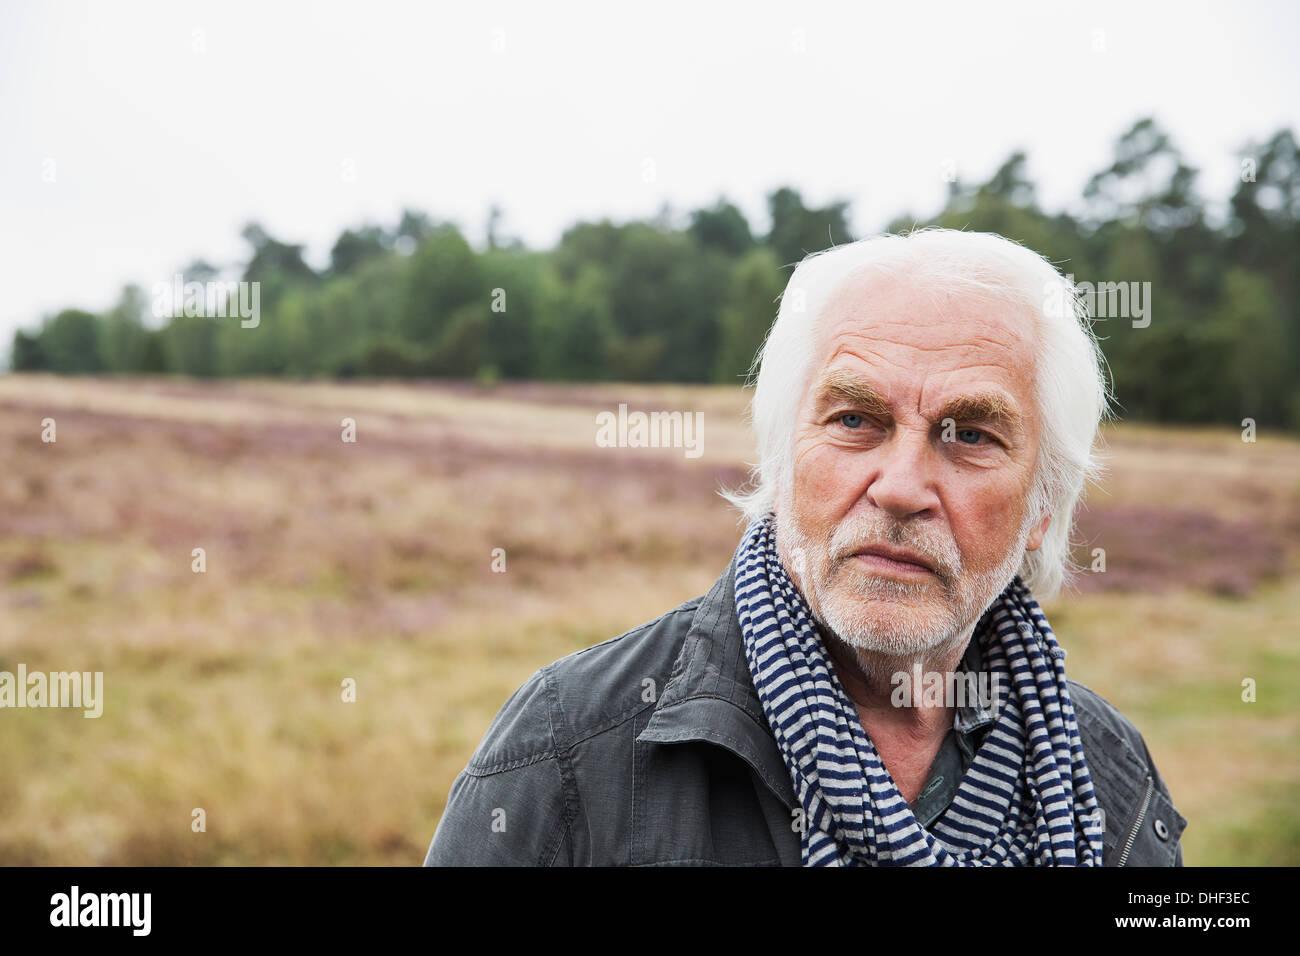 Portrait of senior man with grey hair - Stock Image